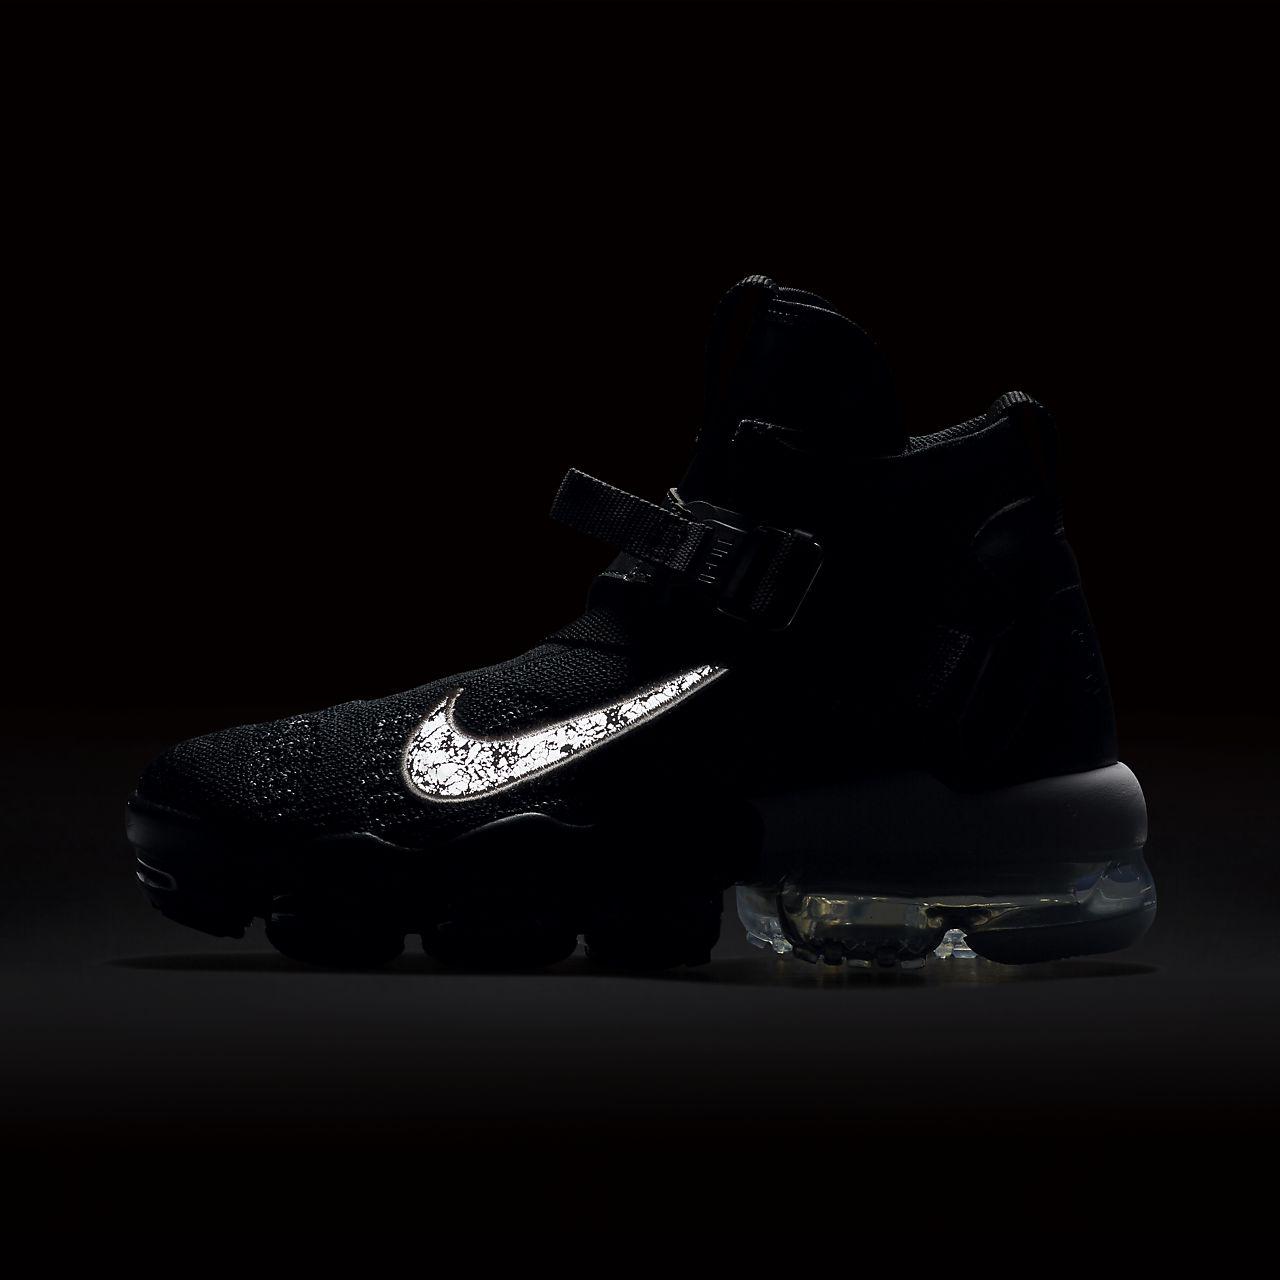 b00a01ed08b0 Nike Air VaporMax Premier Flyknit Men s Shoe. Nike.com GB